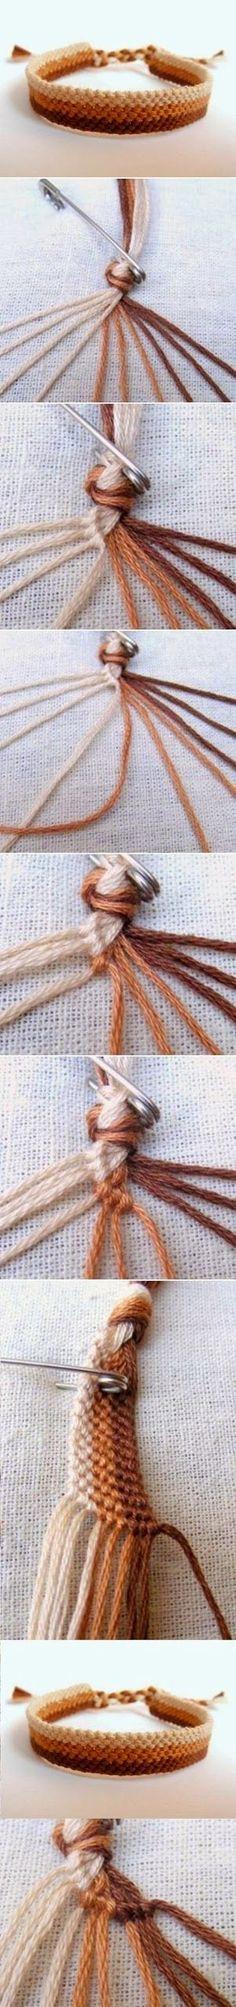 Diy easy weave bracelet diy crafts tutorials diy by bleu Bracelet Crafts, Jewelry Crafts, Crochet Bracelet, Woven Bracelets, Braclets Diy, Knotted Bracelet, String Bracelets, Slap Bracelets, Charm Bracelets